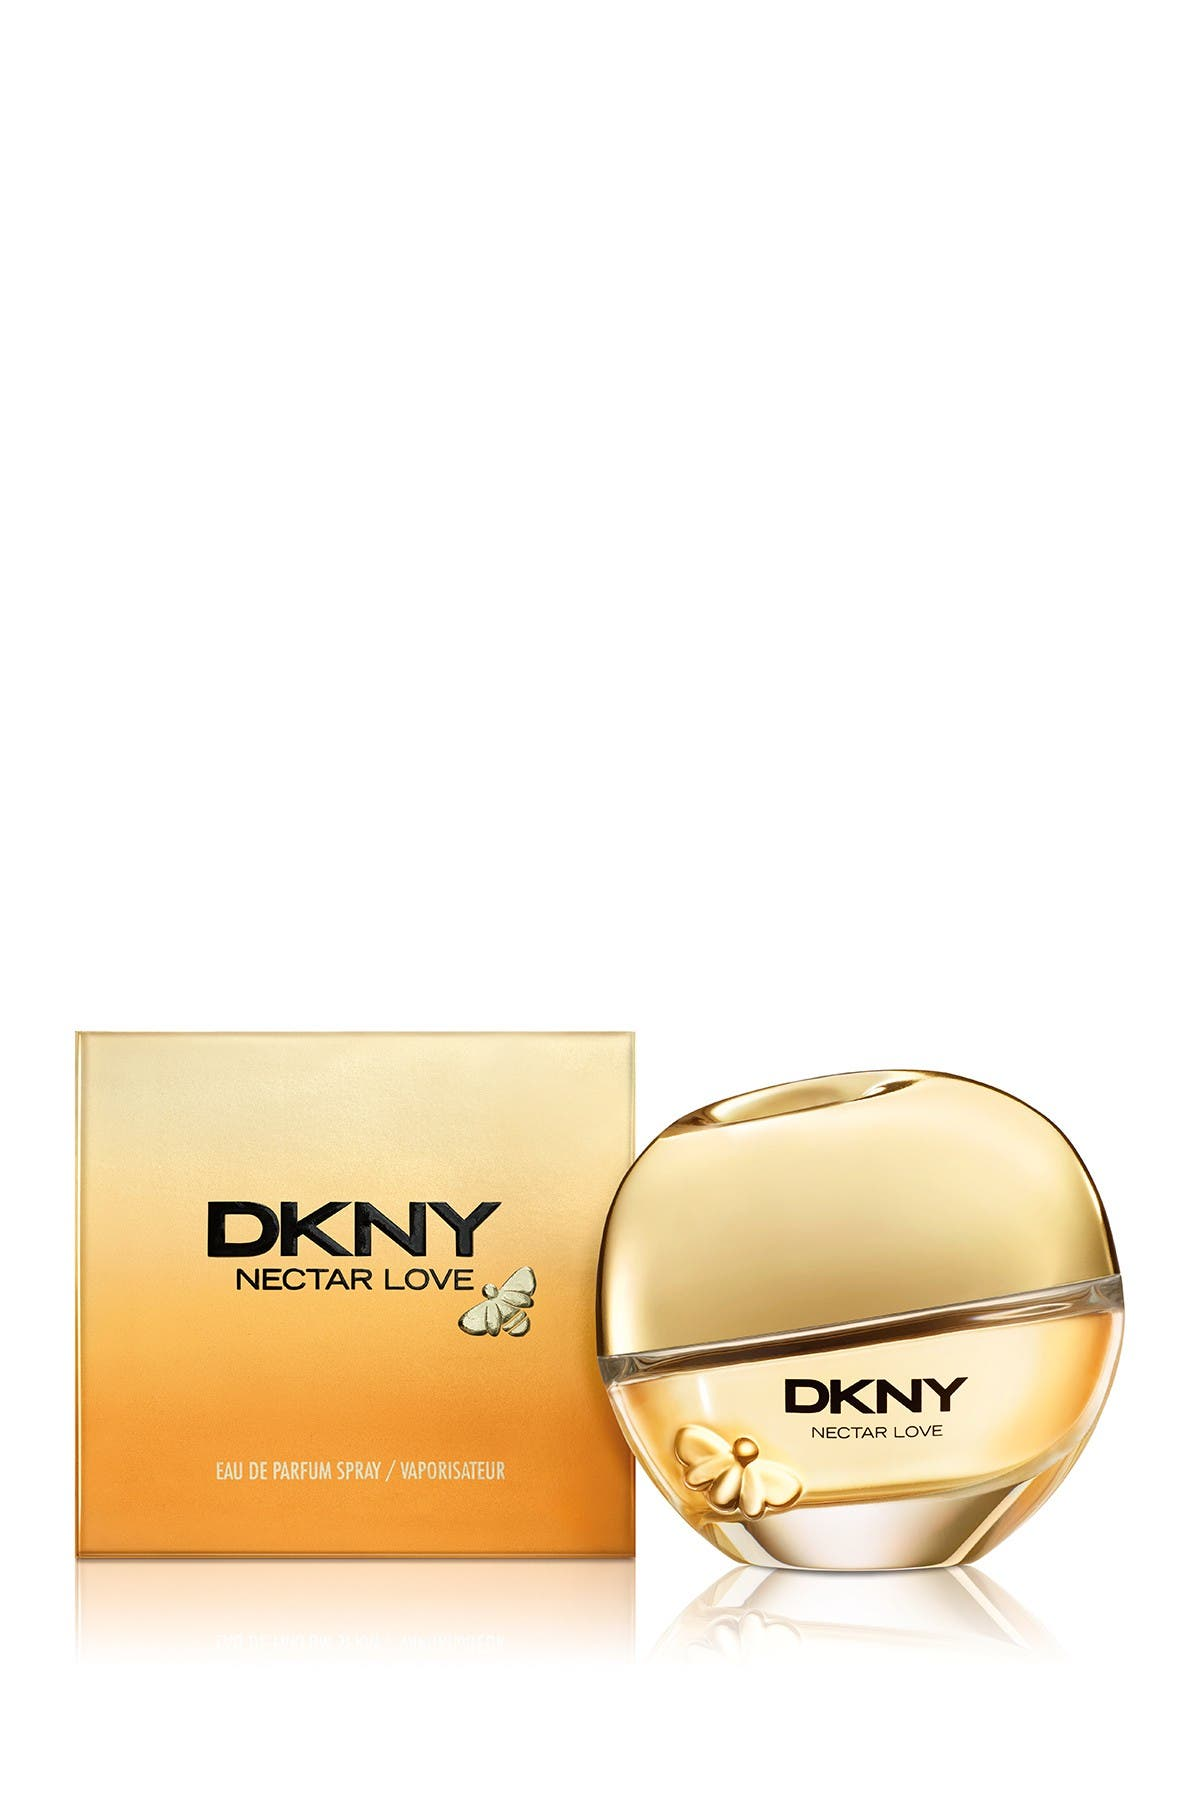 Image of DKNY Nectar Love - 30ml/1.0 fl oz.